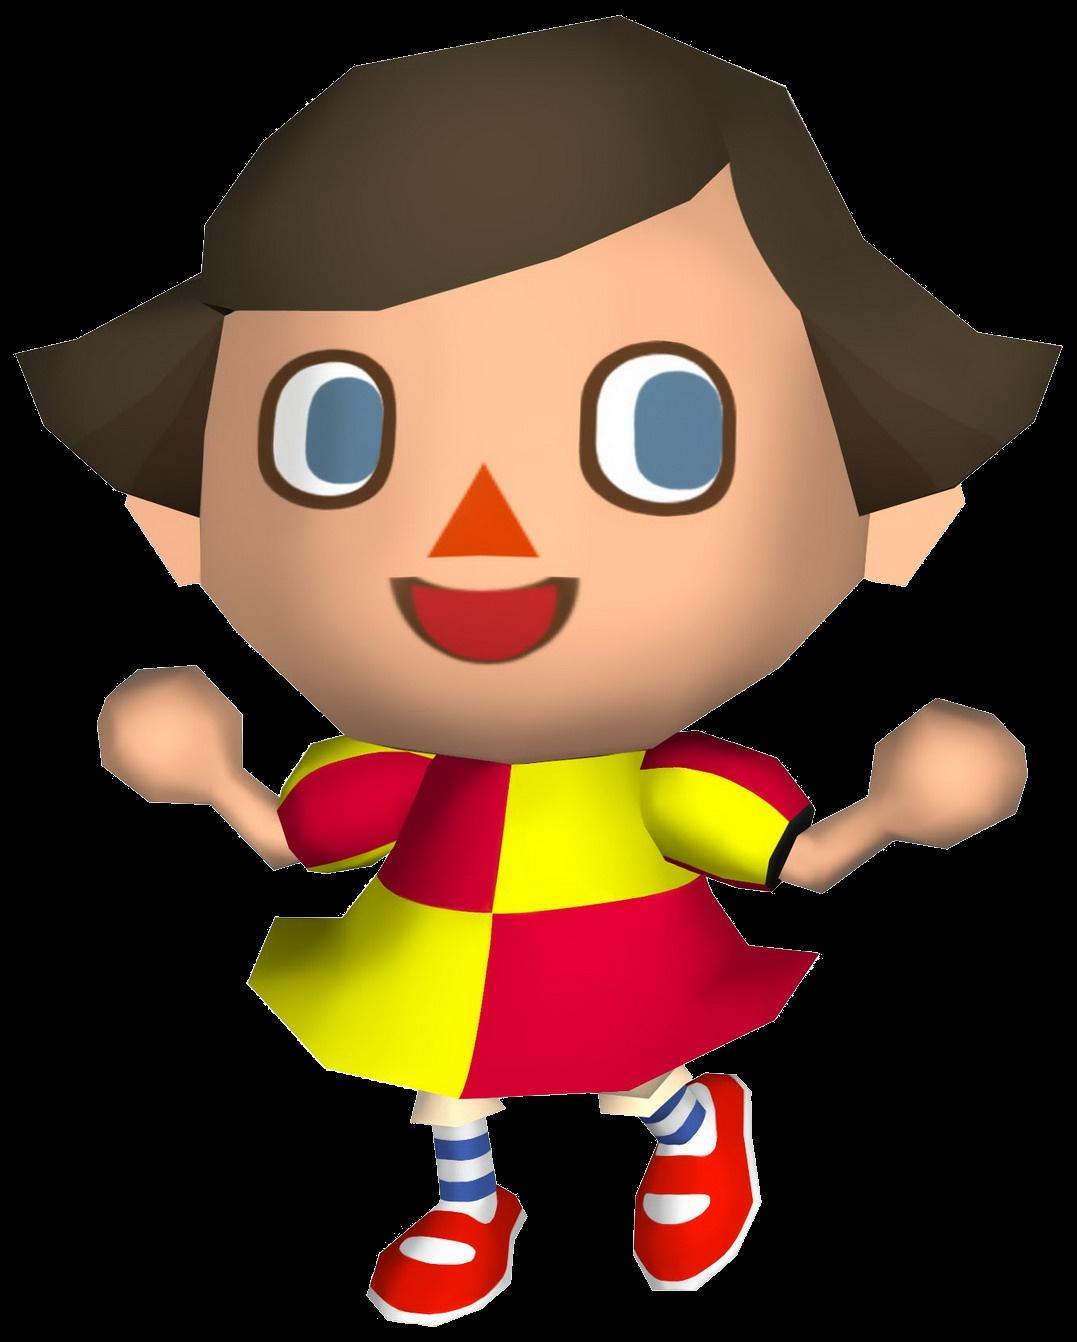 Homedesigner Player Animal Crossing Wiki Fandom Powered By Wikia